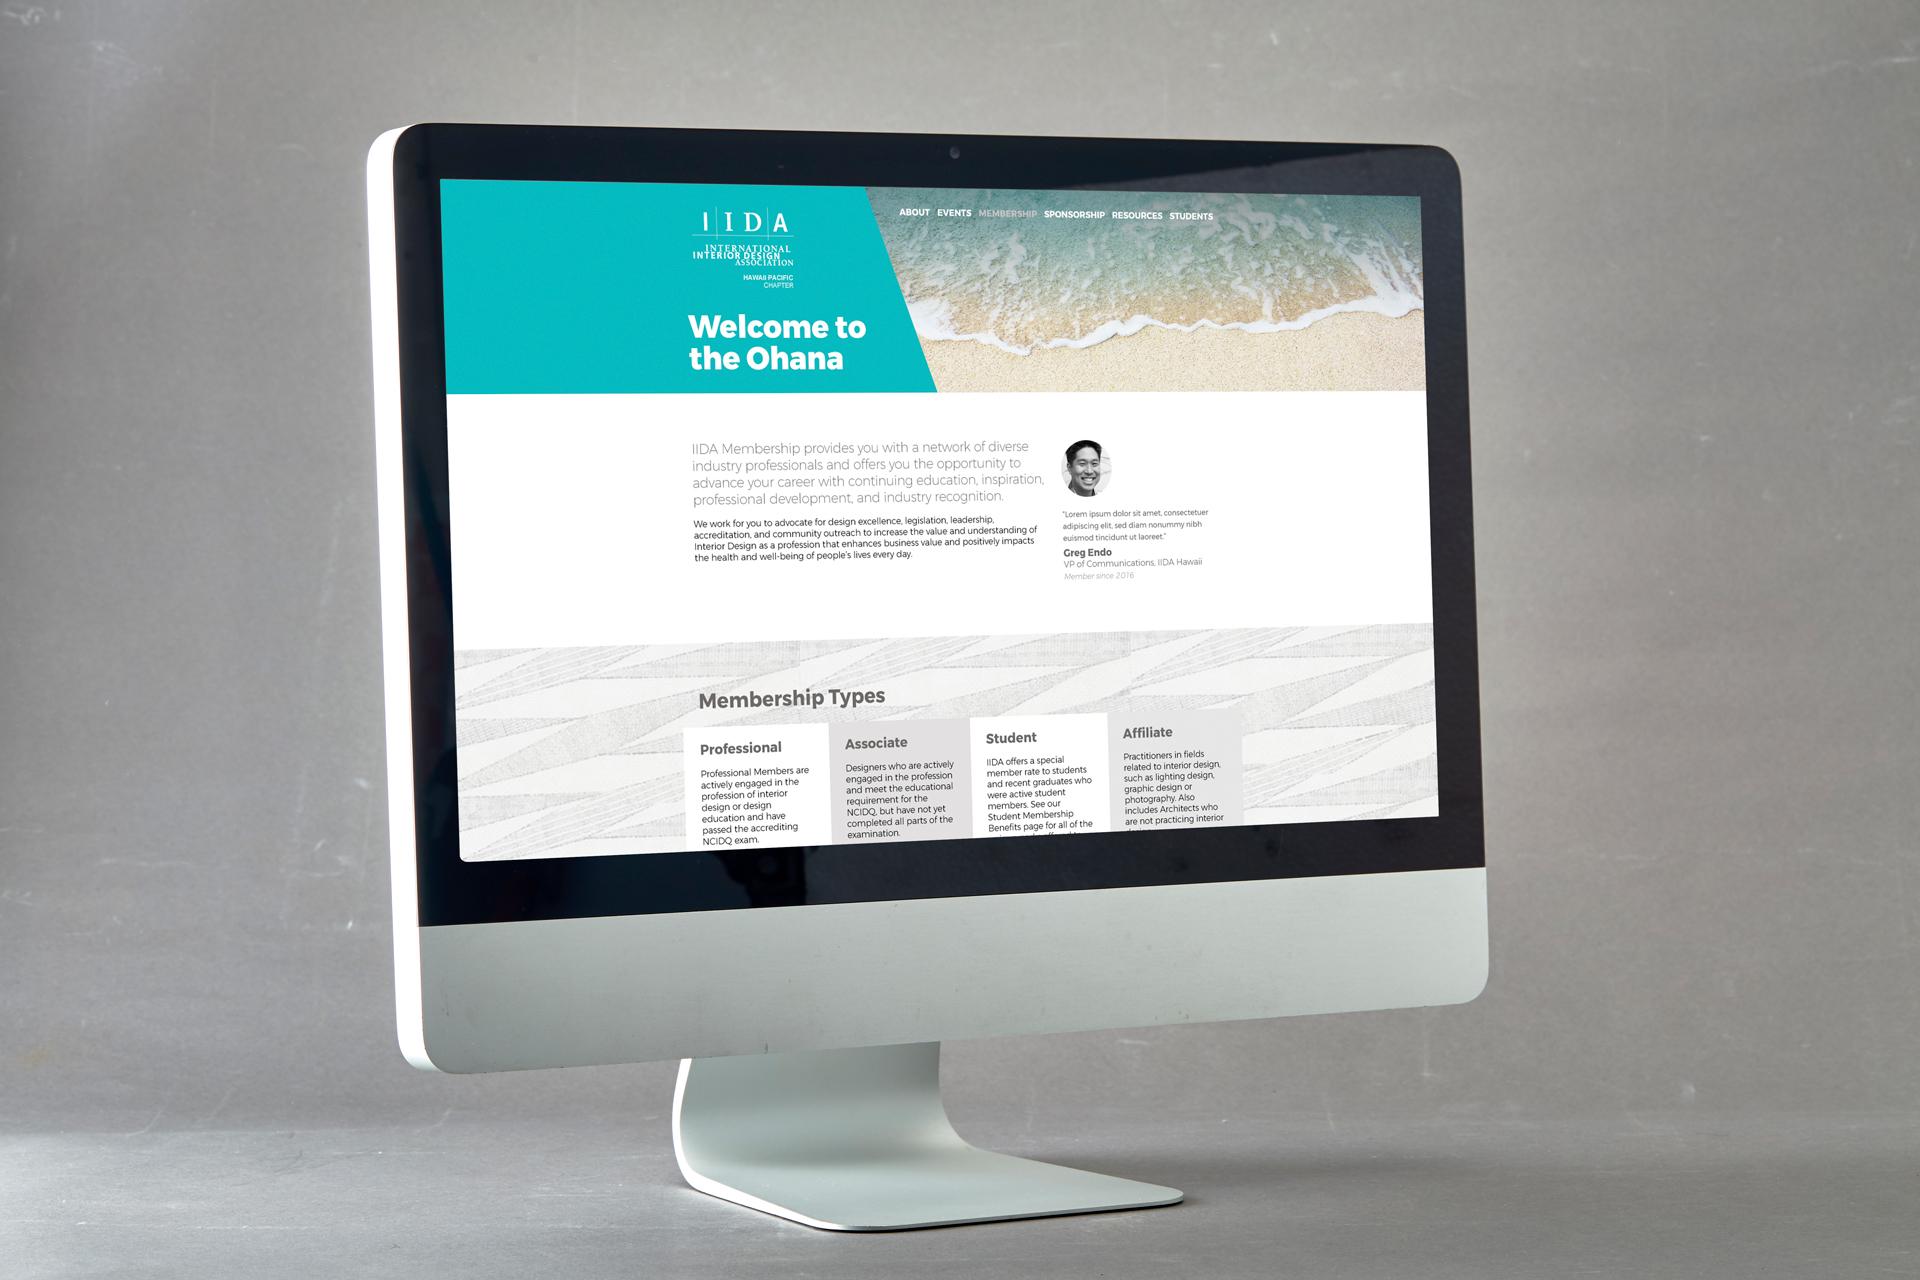 IIDAHPCwebsite5.jpg